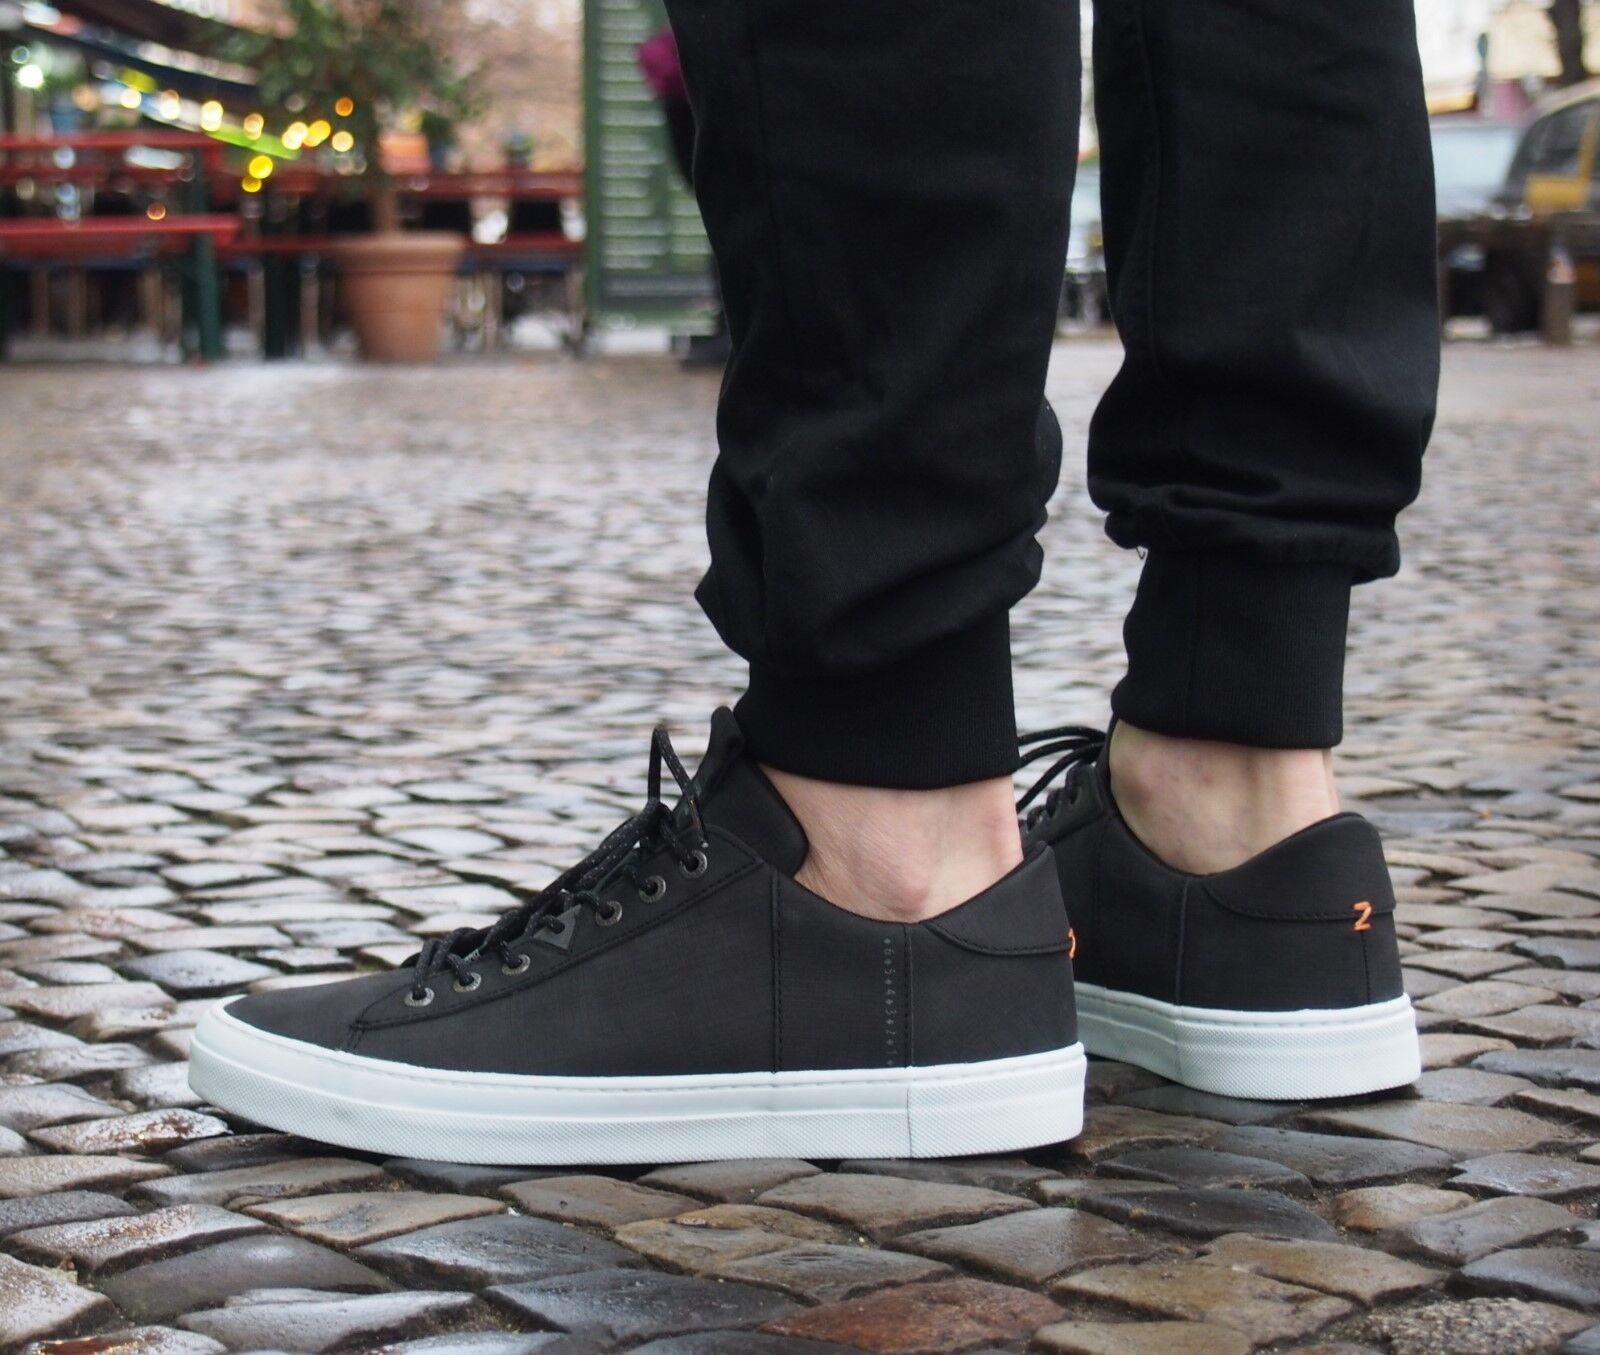 HUB Footwear Schuh Hook Scratched schwarz Weiß Turnschuhe Herrenschuh Echtleder NEU